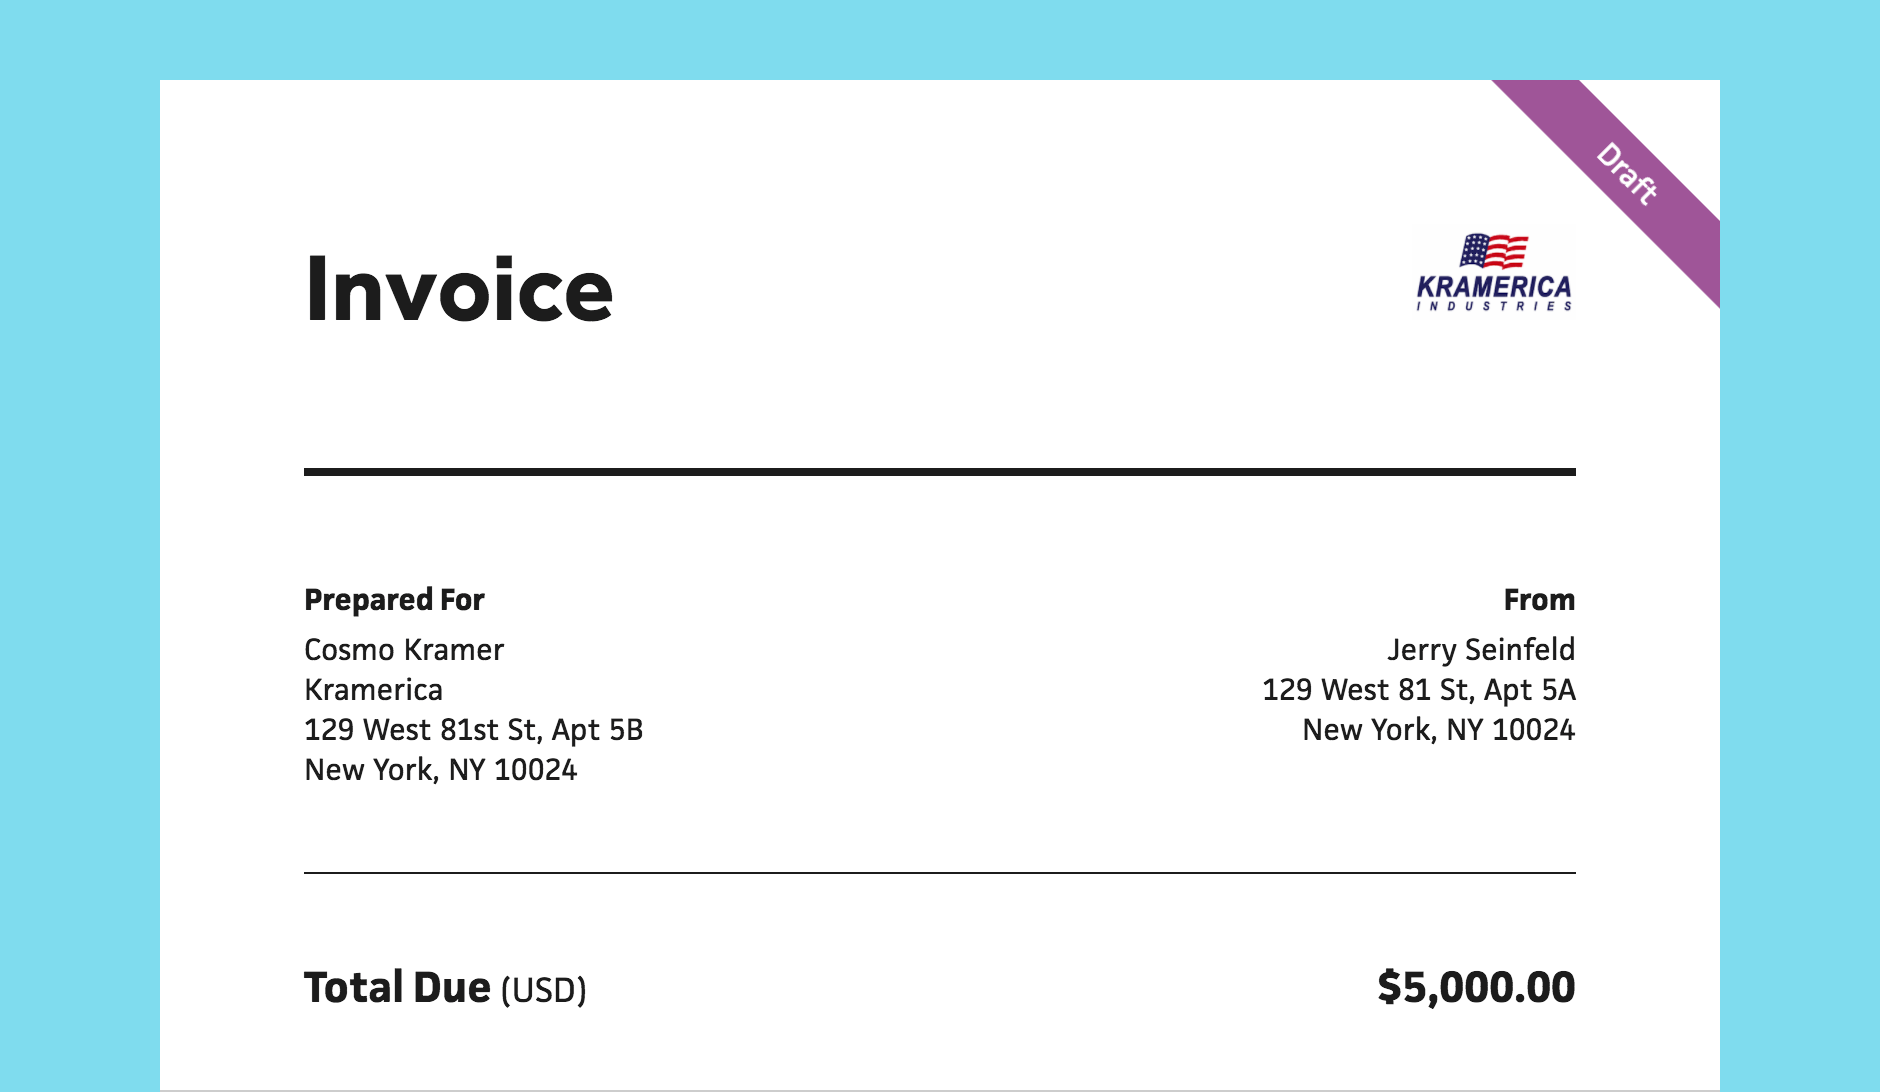 invoice draft